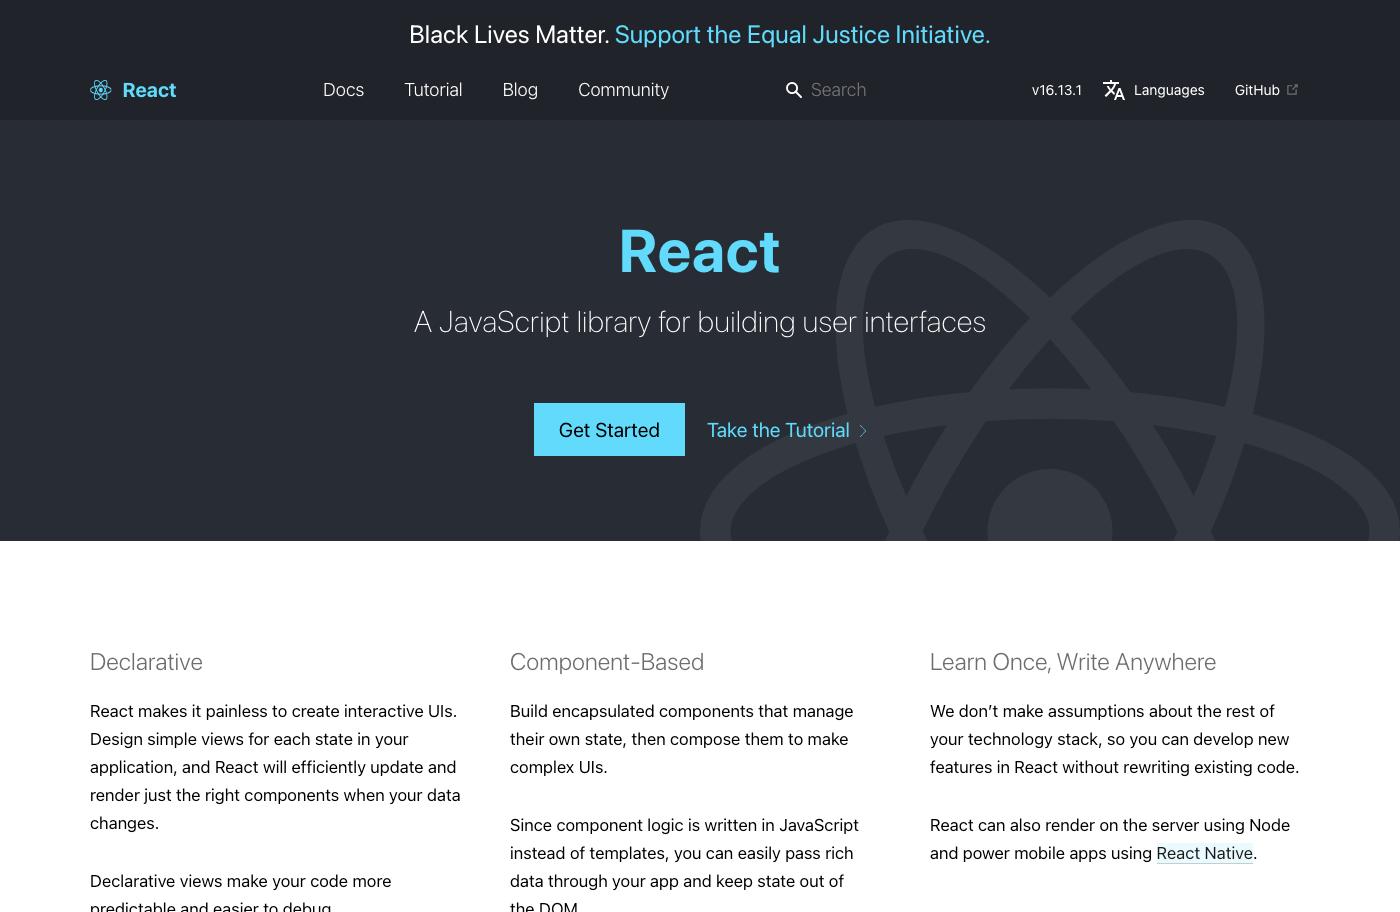 React - پروژه های جدید را سریعتر شروع کنید